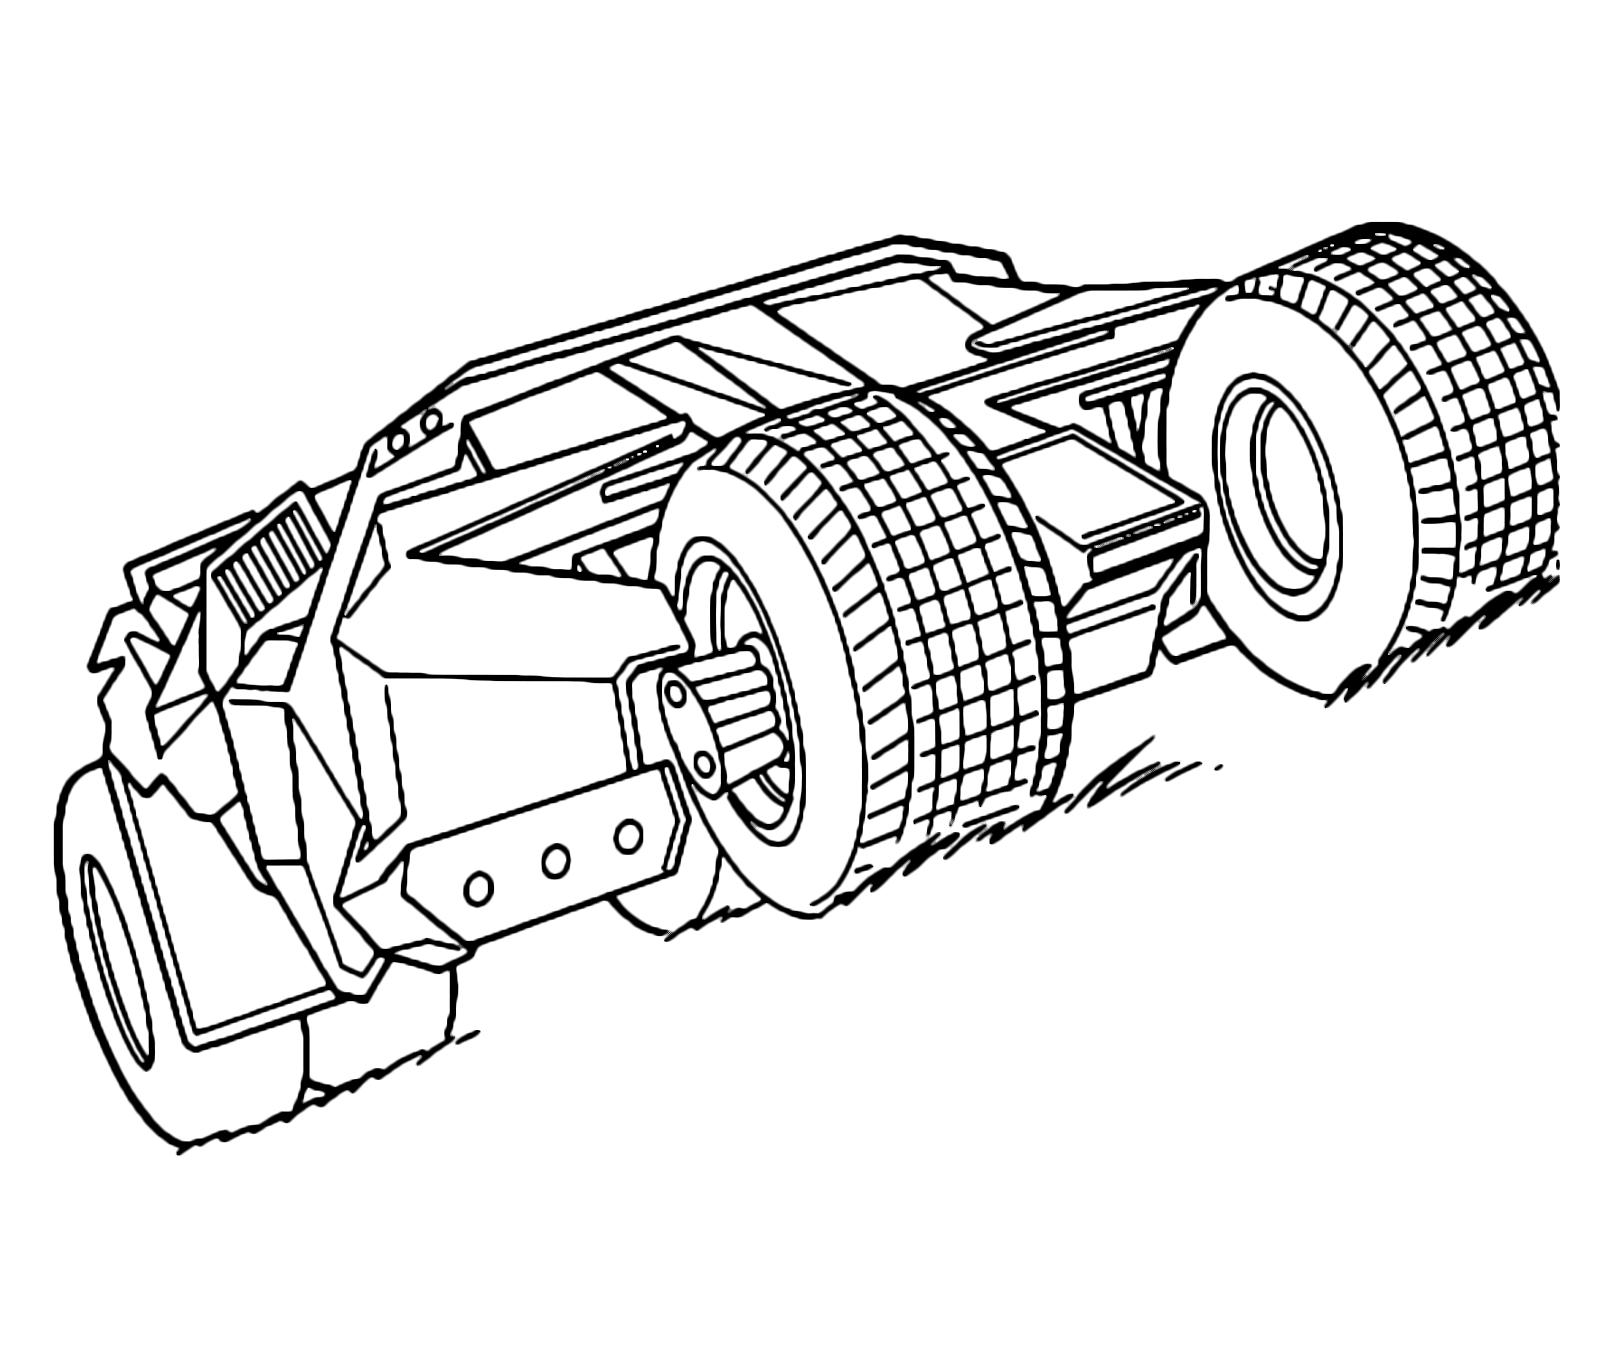 disegni da colorare macchina di batman